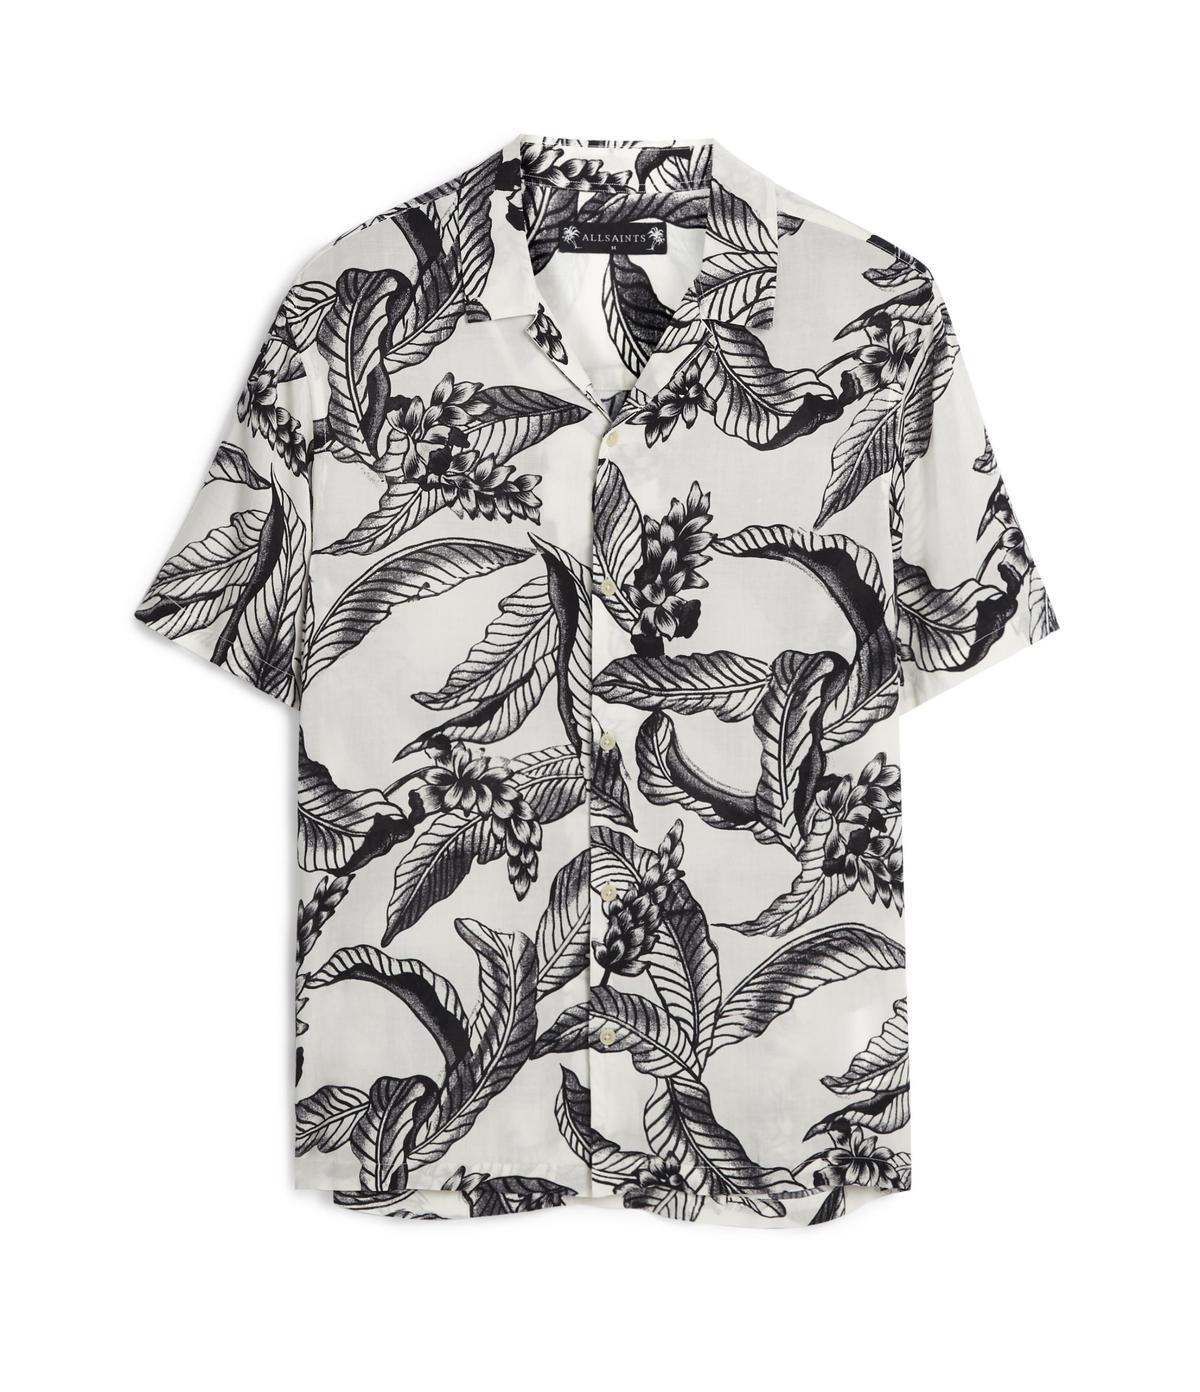 ALLSAINTS Kahuna白底印花襯衫。NT$4800(ALLSAINTS提供)